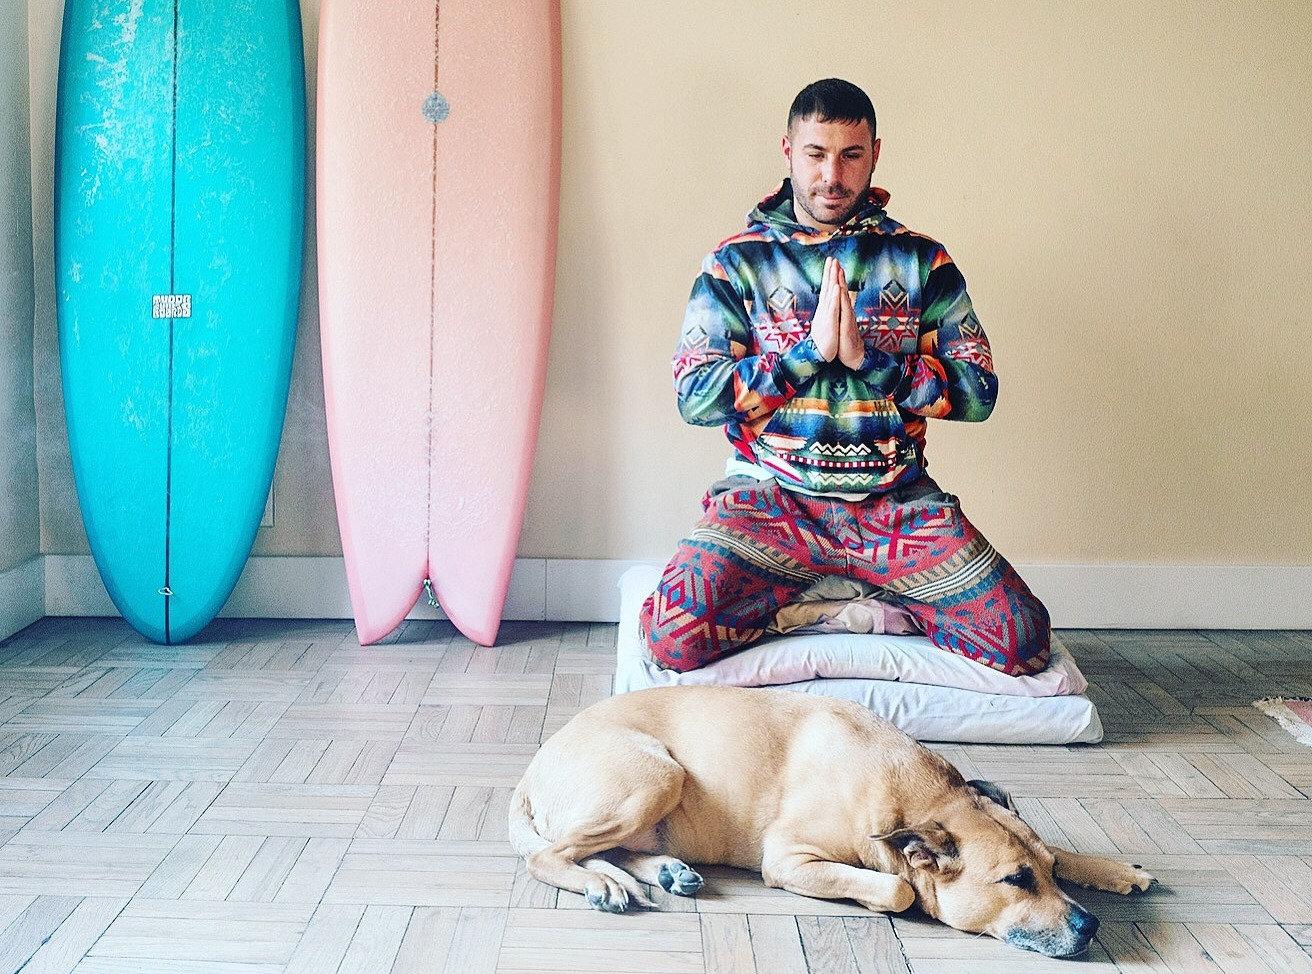 surfing Rabbi Yoga teacher meditation Kabbalah Judaism spirituality